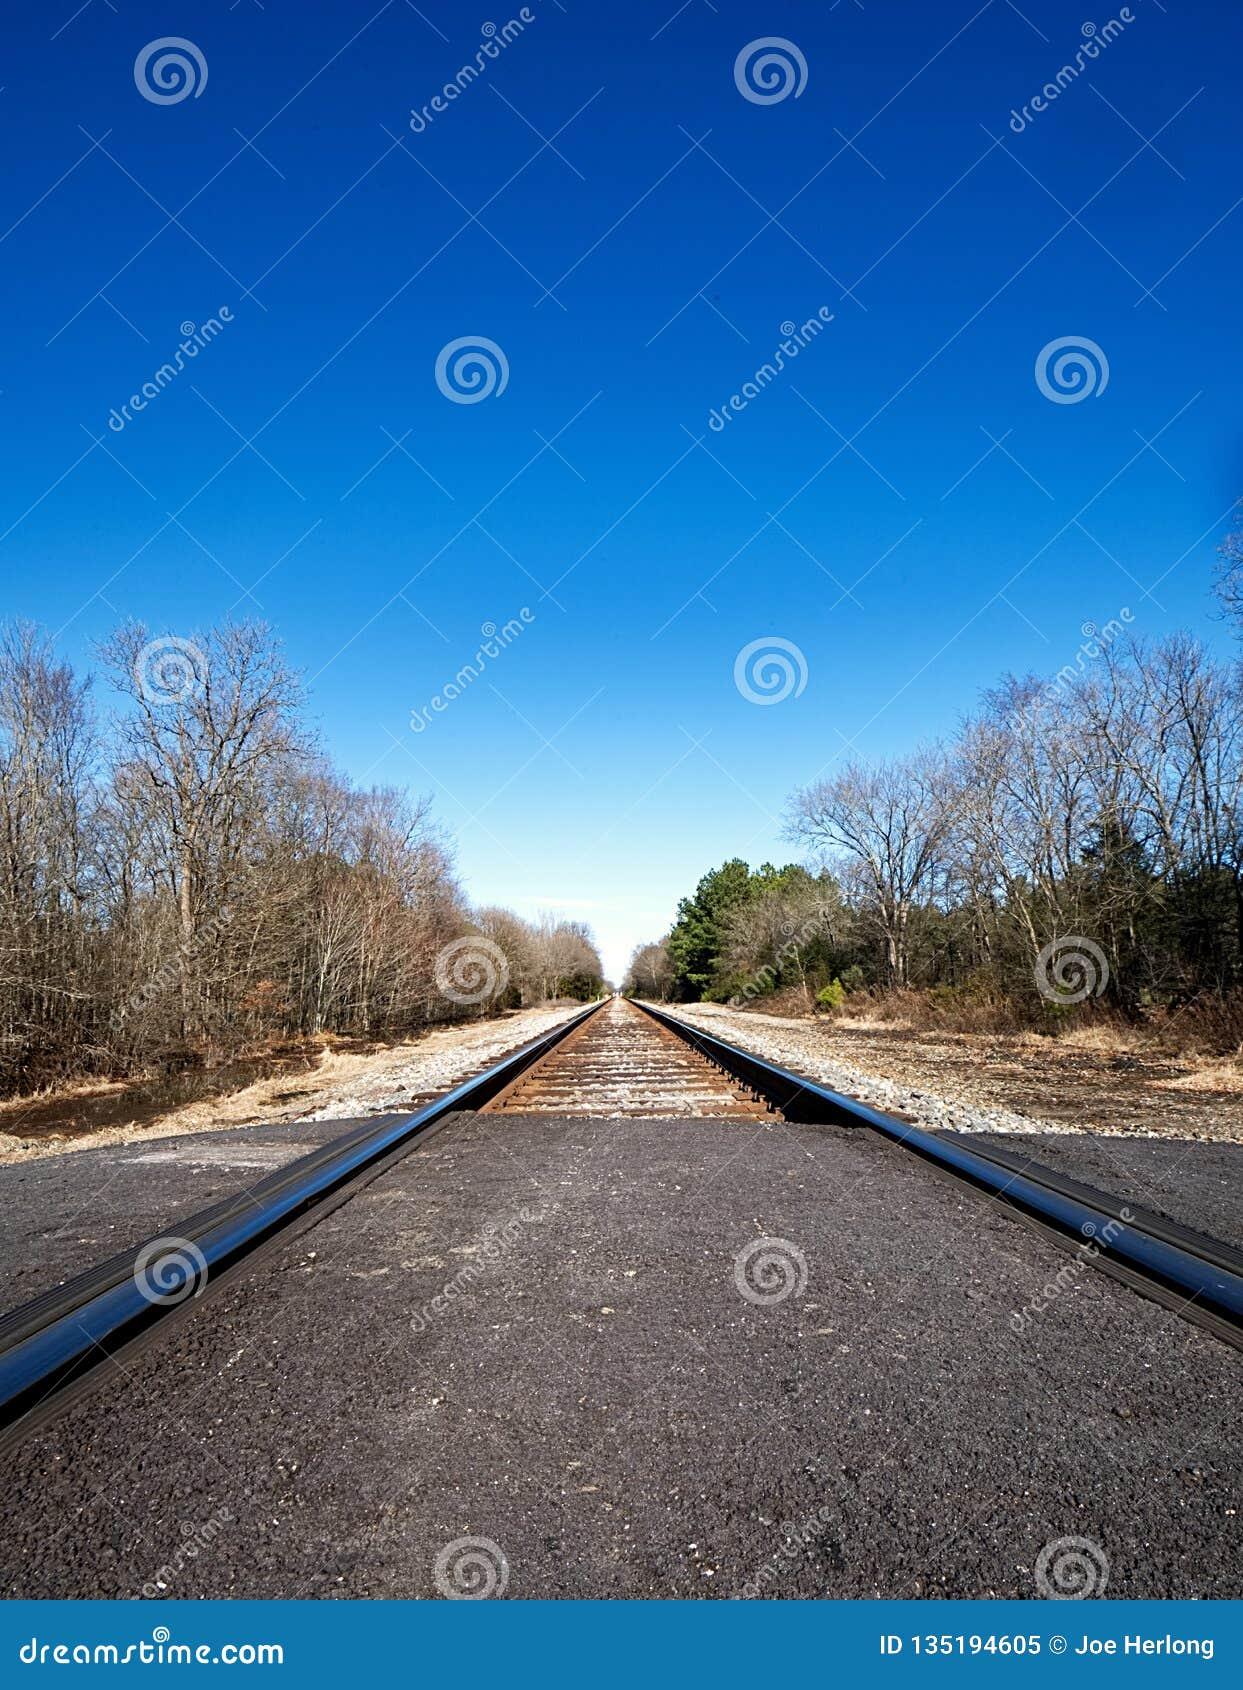 A closeup of railroad tracks leading into infinity and a brilliant blue sky.